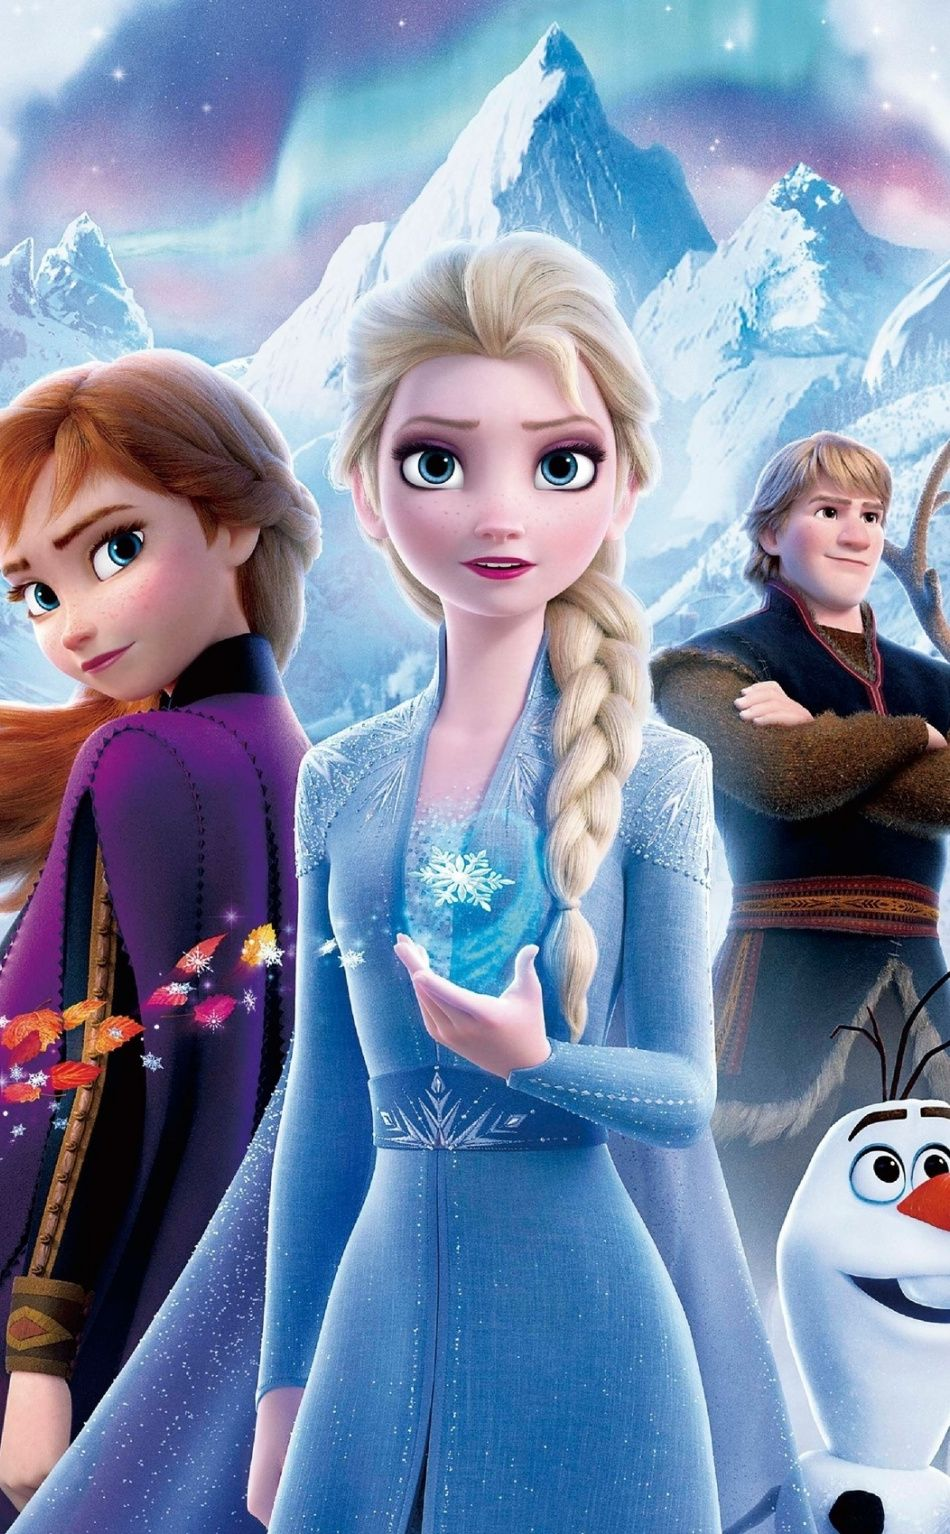 950x1534 Frozen 2 Princess Sisters Movie 2019 Wallpaper Disney Frozen Elsa Art Frozen Pictures Frozen Film